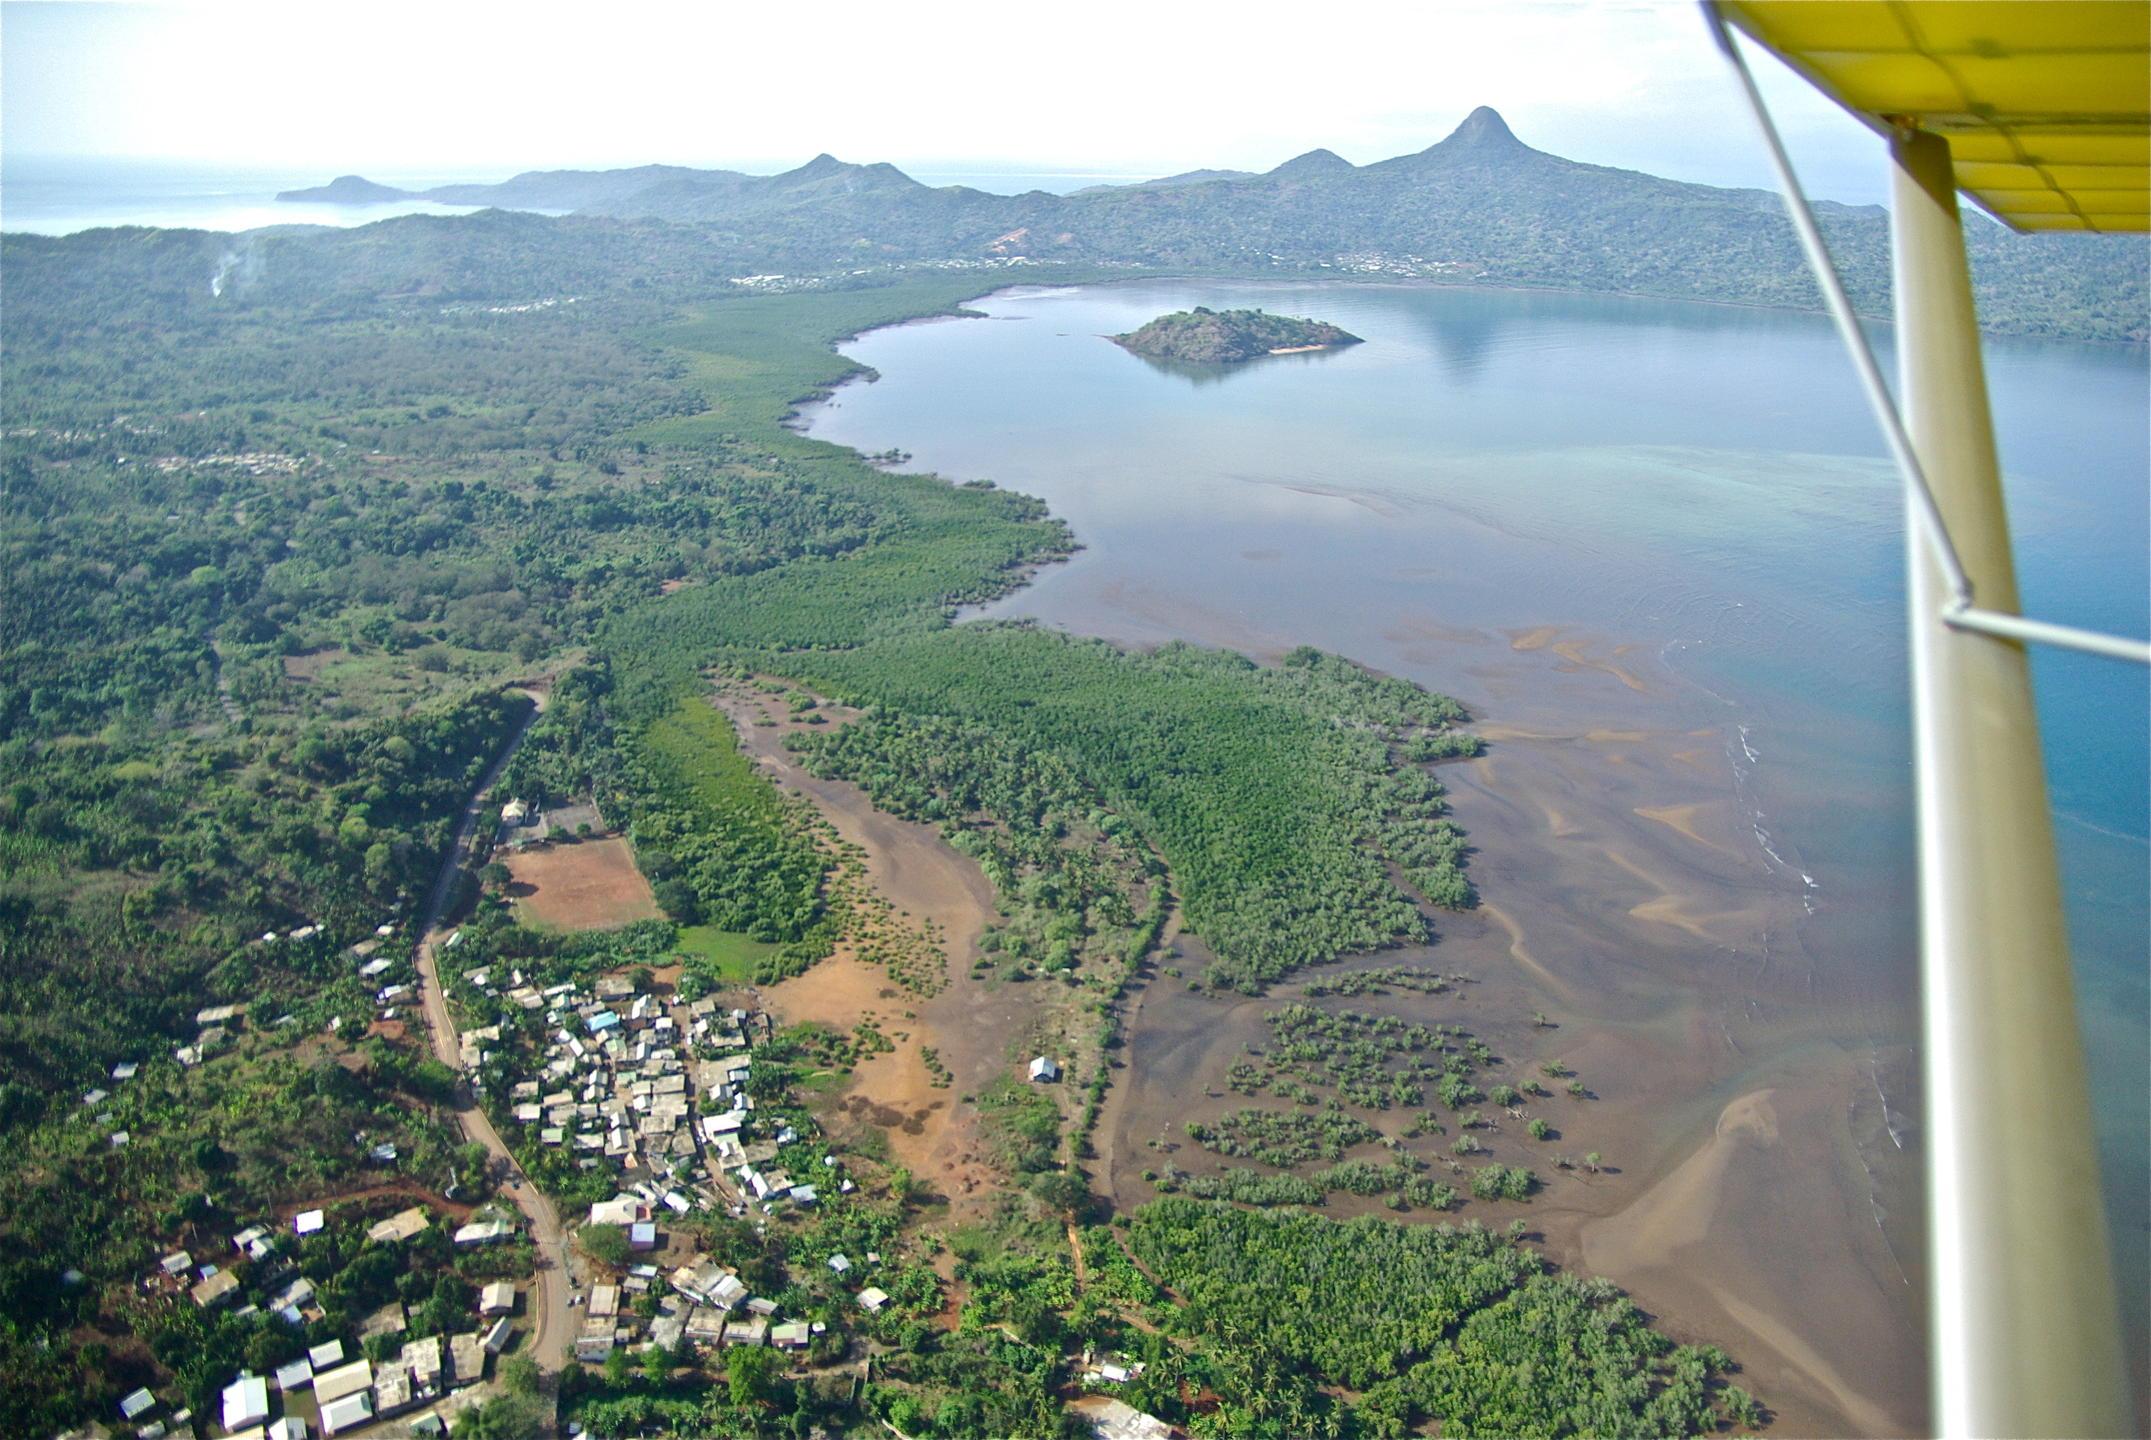 Mangrove de Mayotte, Baie de Chirongui